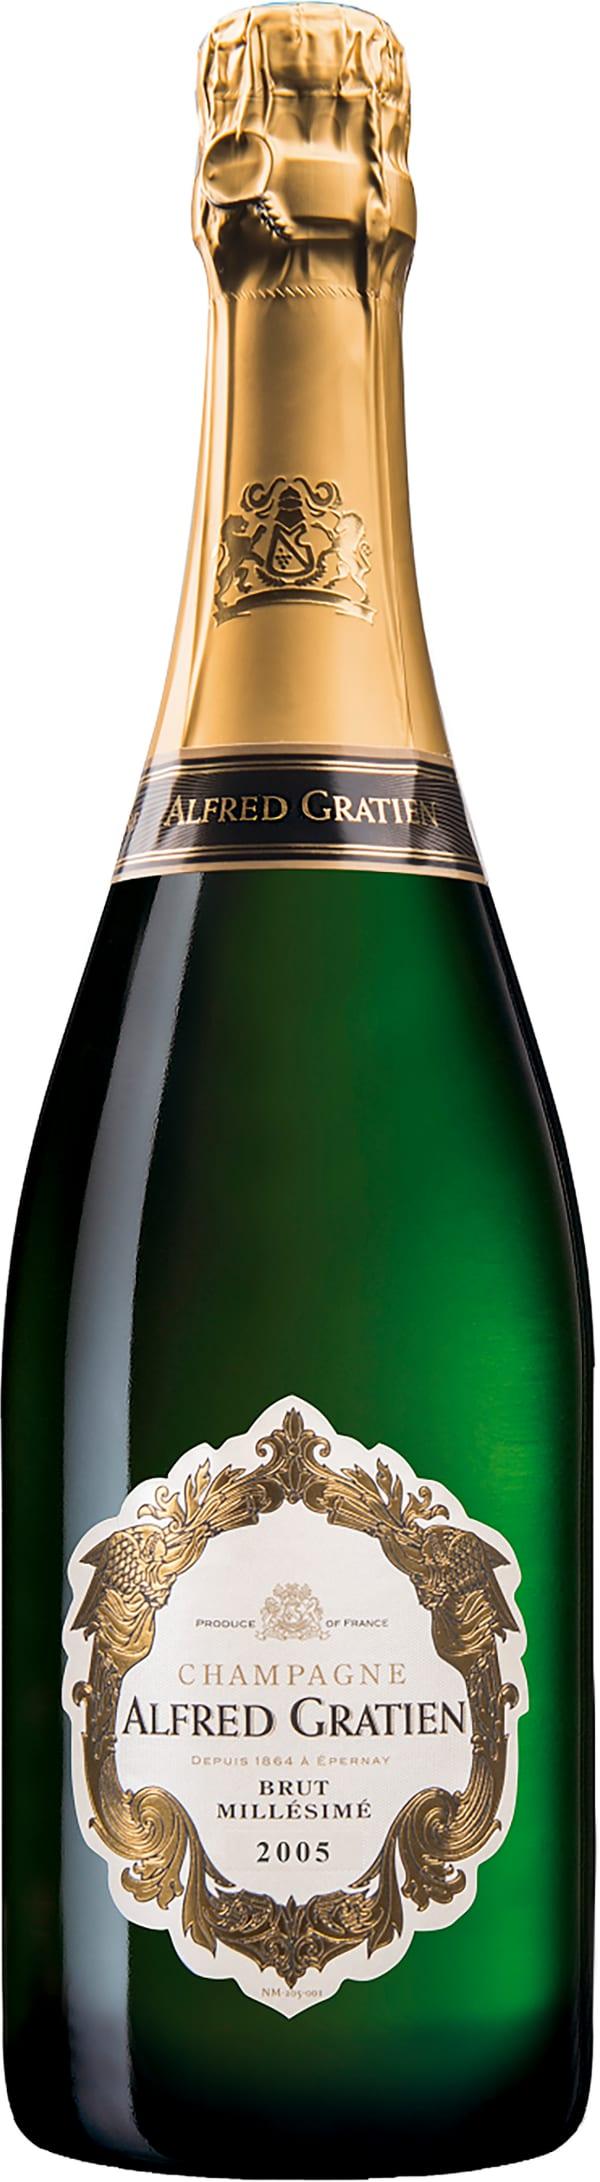 Alfred Gratien Millesime Champagne Brut 2006